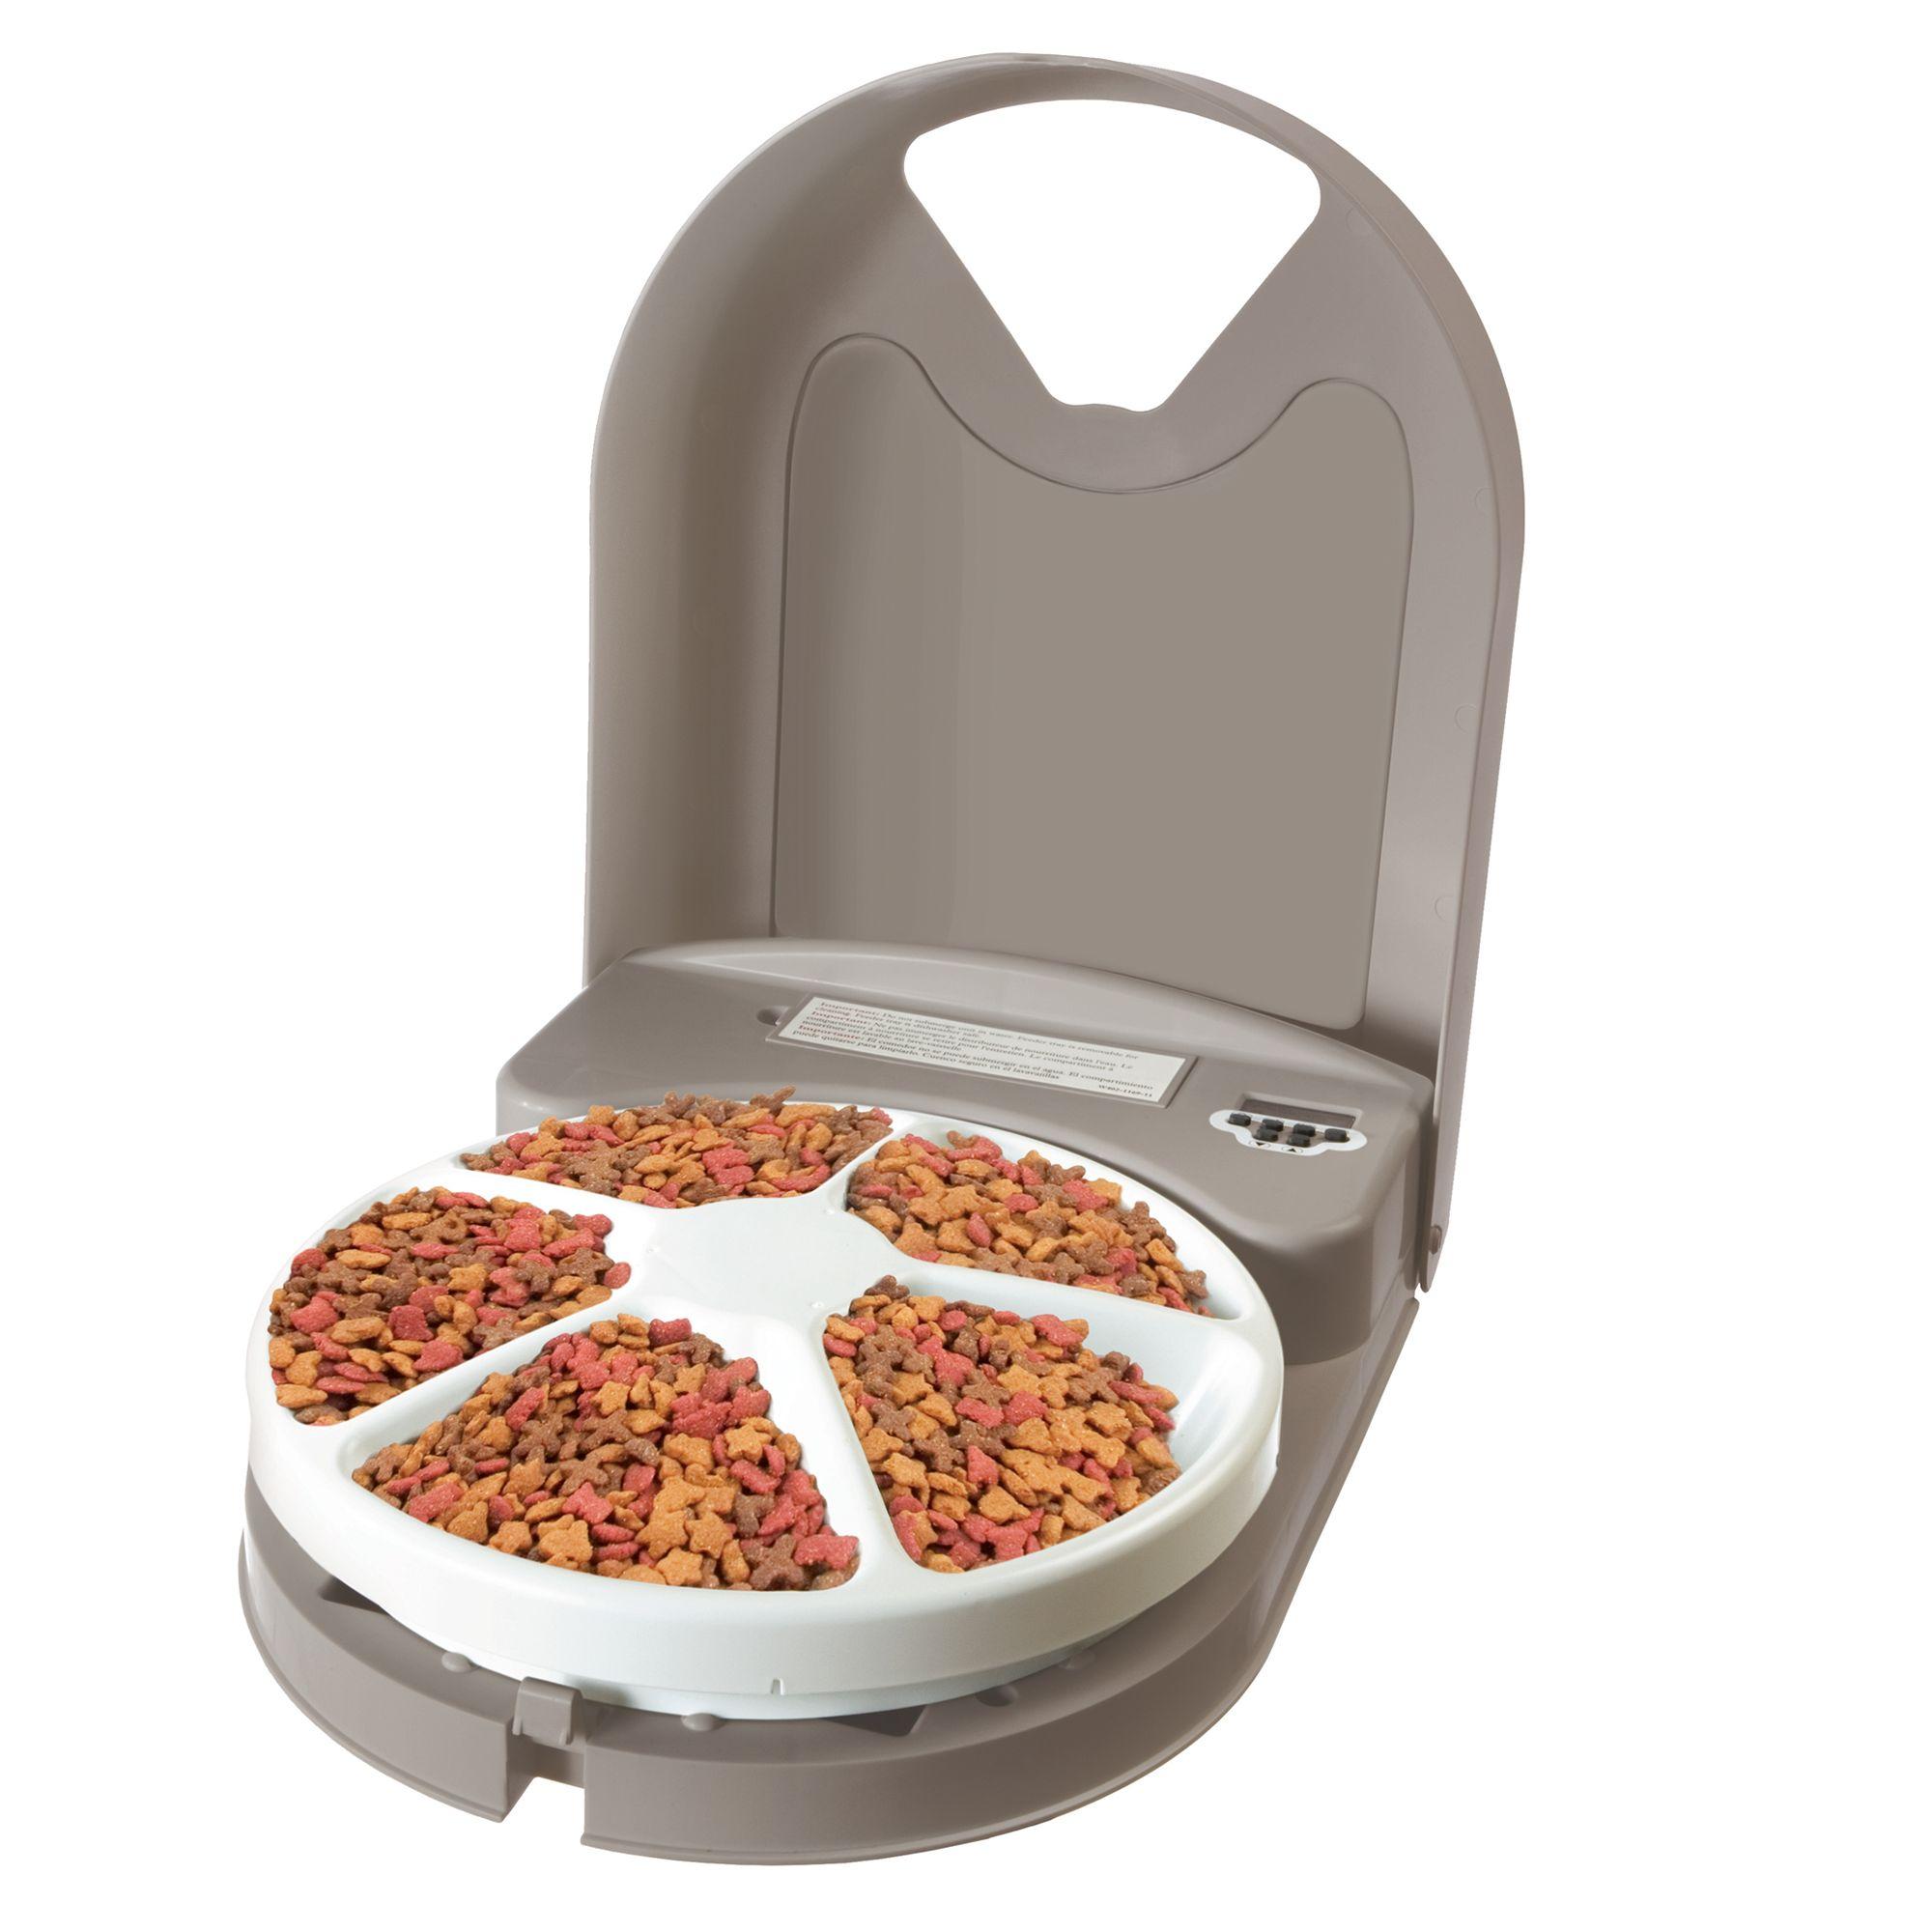 Petsafe Eatwell Trade 5 Meal Automatic Pet Feeder Cat Automatic Feeders Petsmart